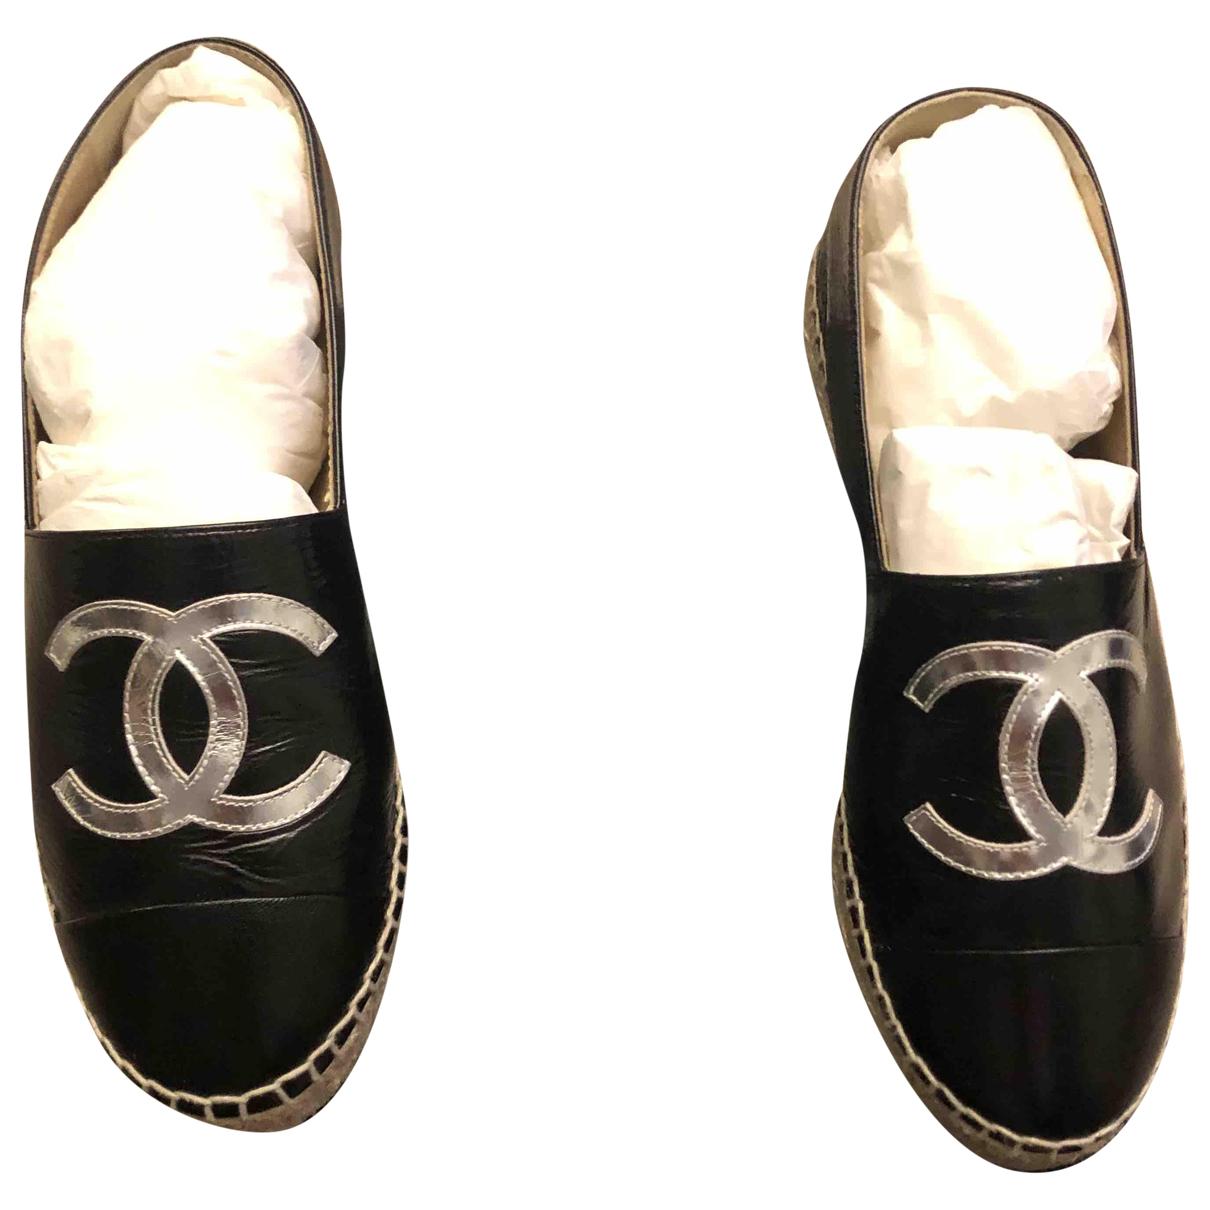 Chanel \N Black Patent leather Espadrilles for Women 38 EU